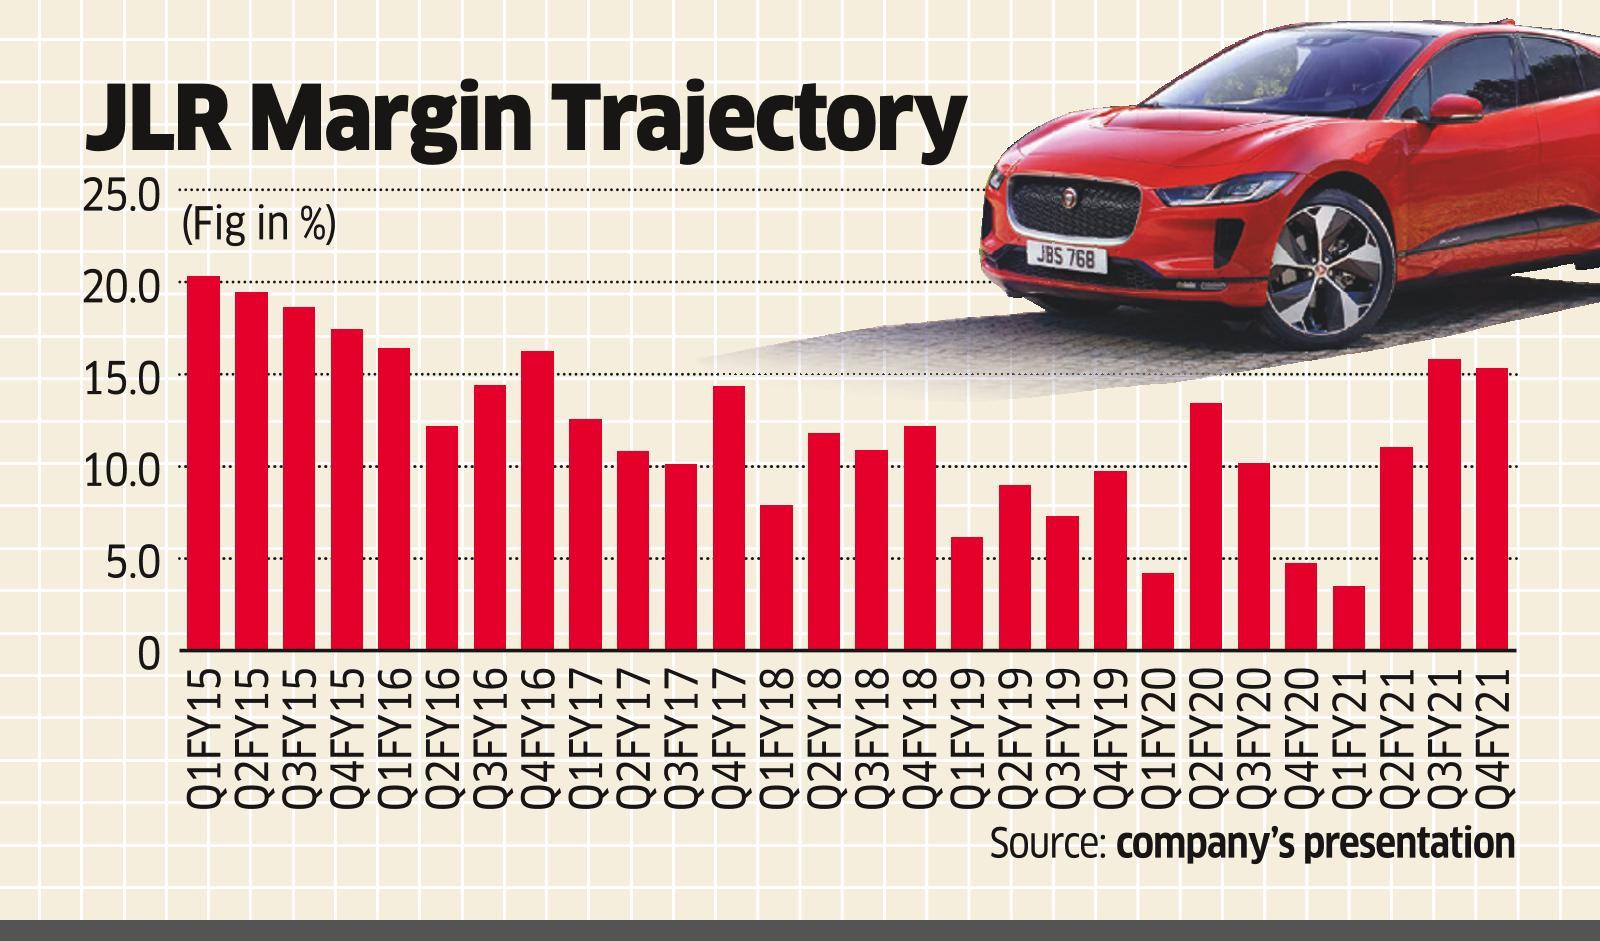 Many Reasons for Tata Motors Stock to Shine Despite Loss